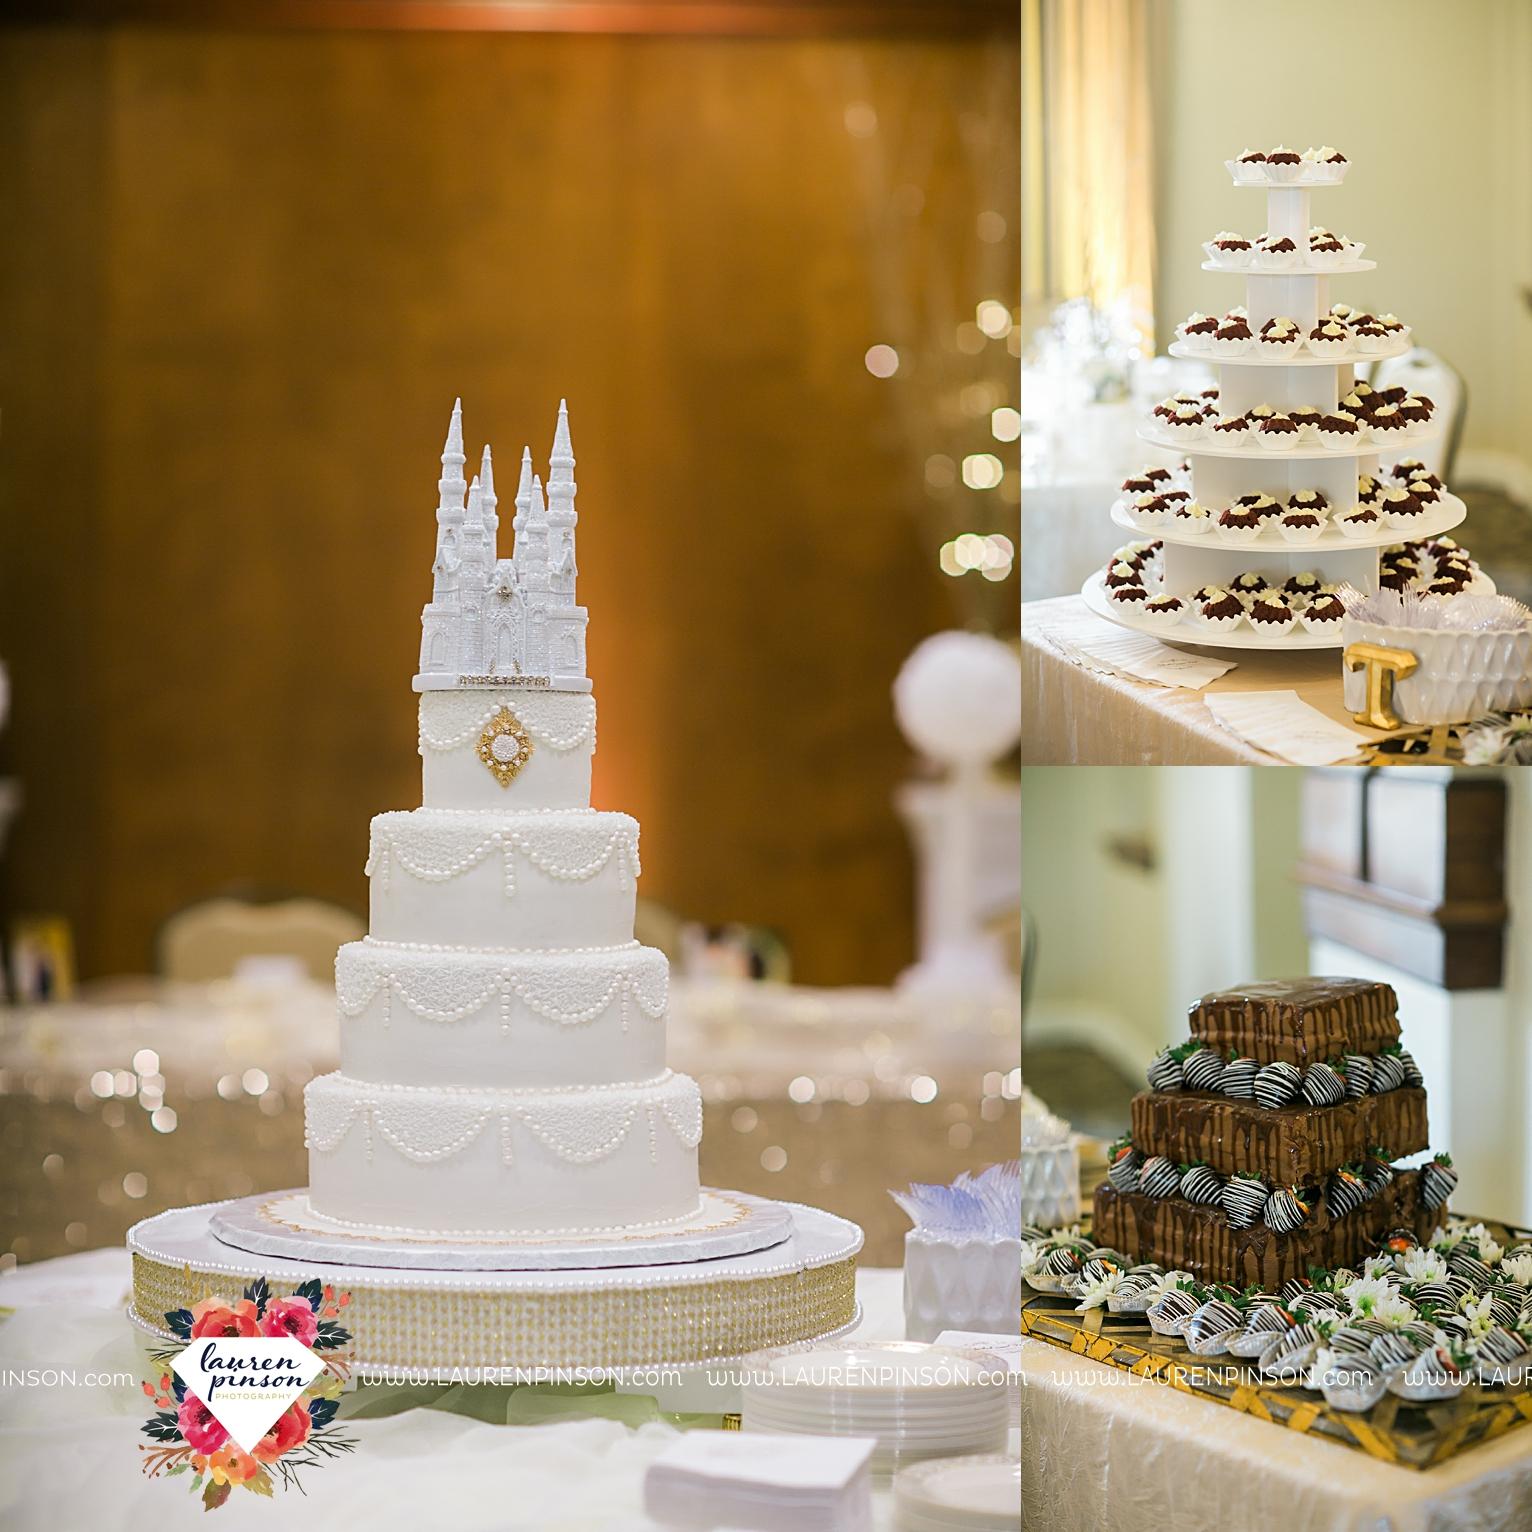 wichita-falls-texas-wedding-photographer-the-forum-by-the-kemp-mayfield-events-ulta-gold-glitter_2856.jpg